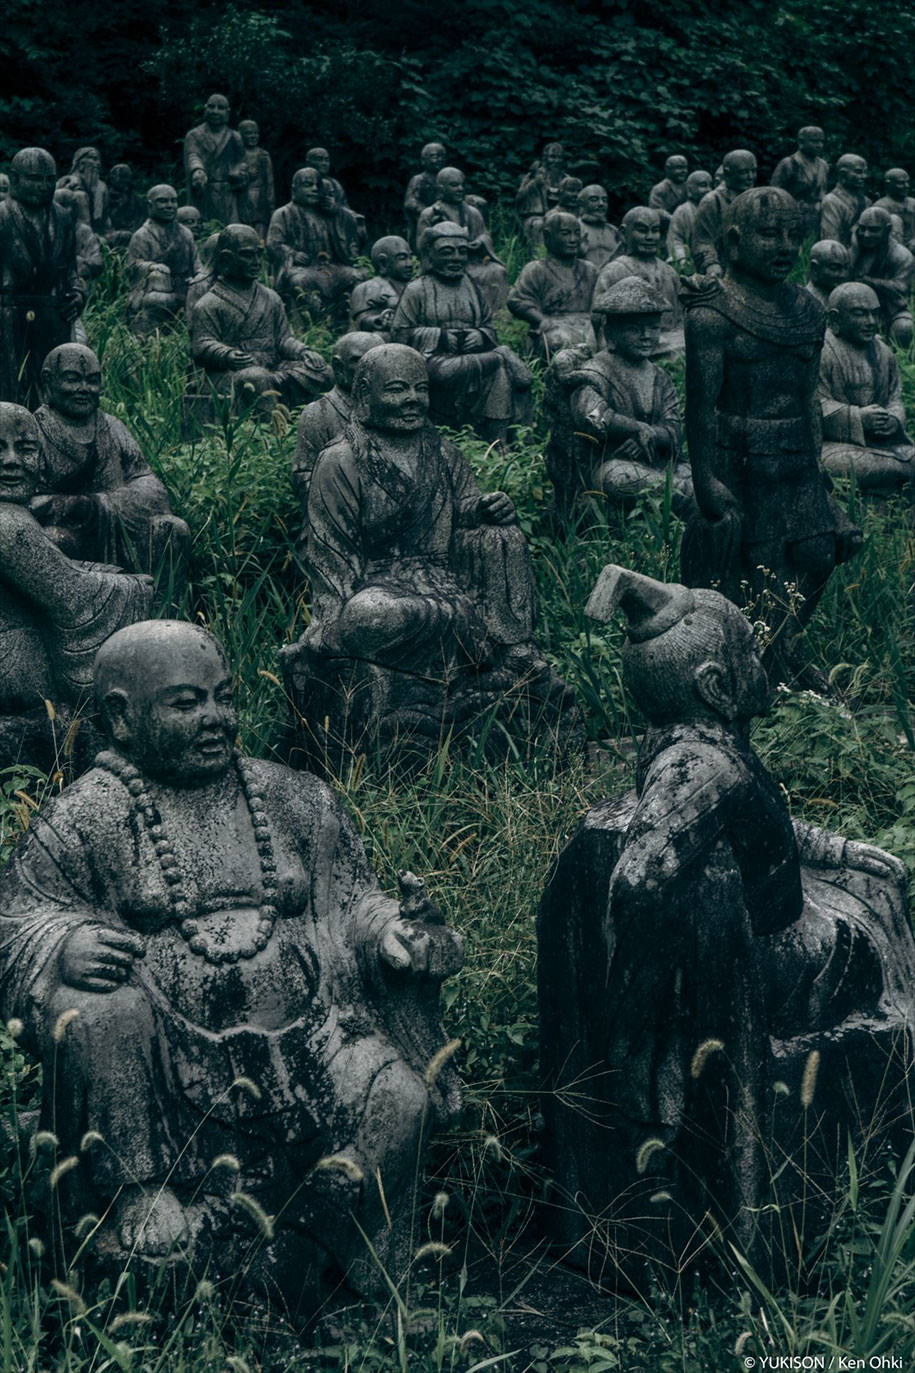 creepy-statues-forbidden-forest-japan-yukisons-ken-ohki-15